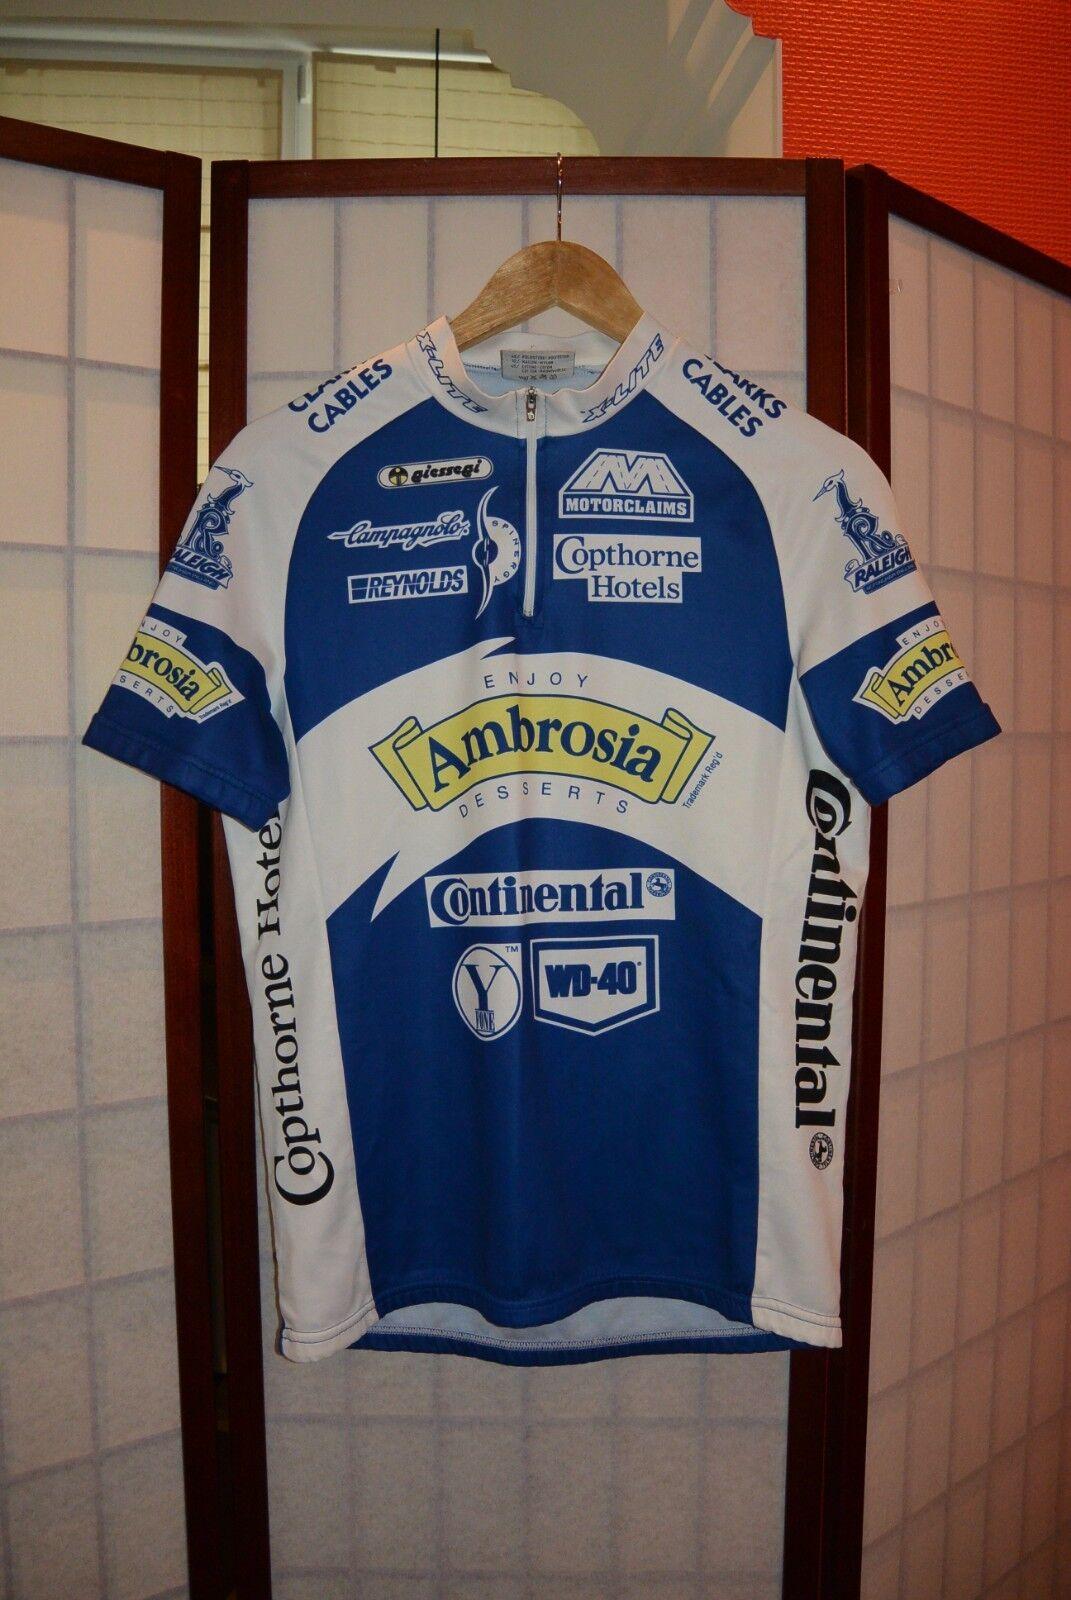 Ambrosia giessegi campagnolo old retro cycling jersey L (Iev)